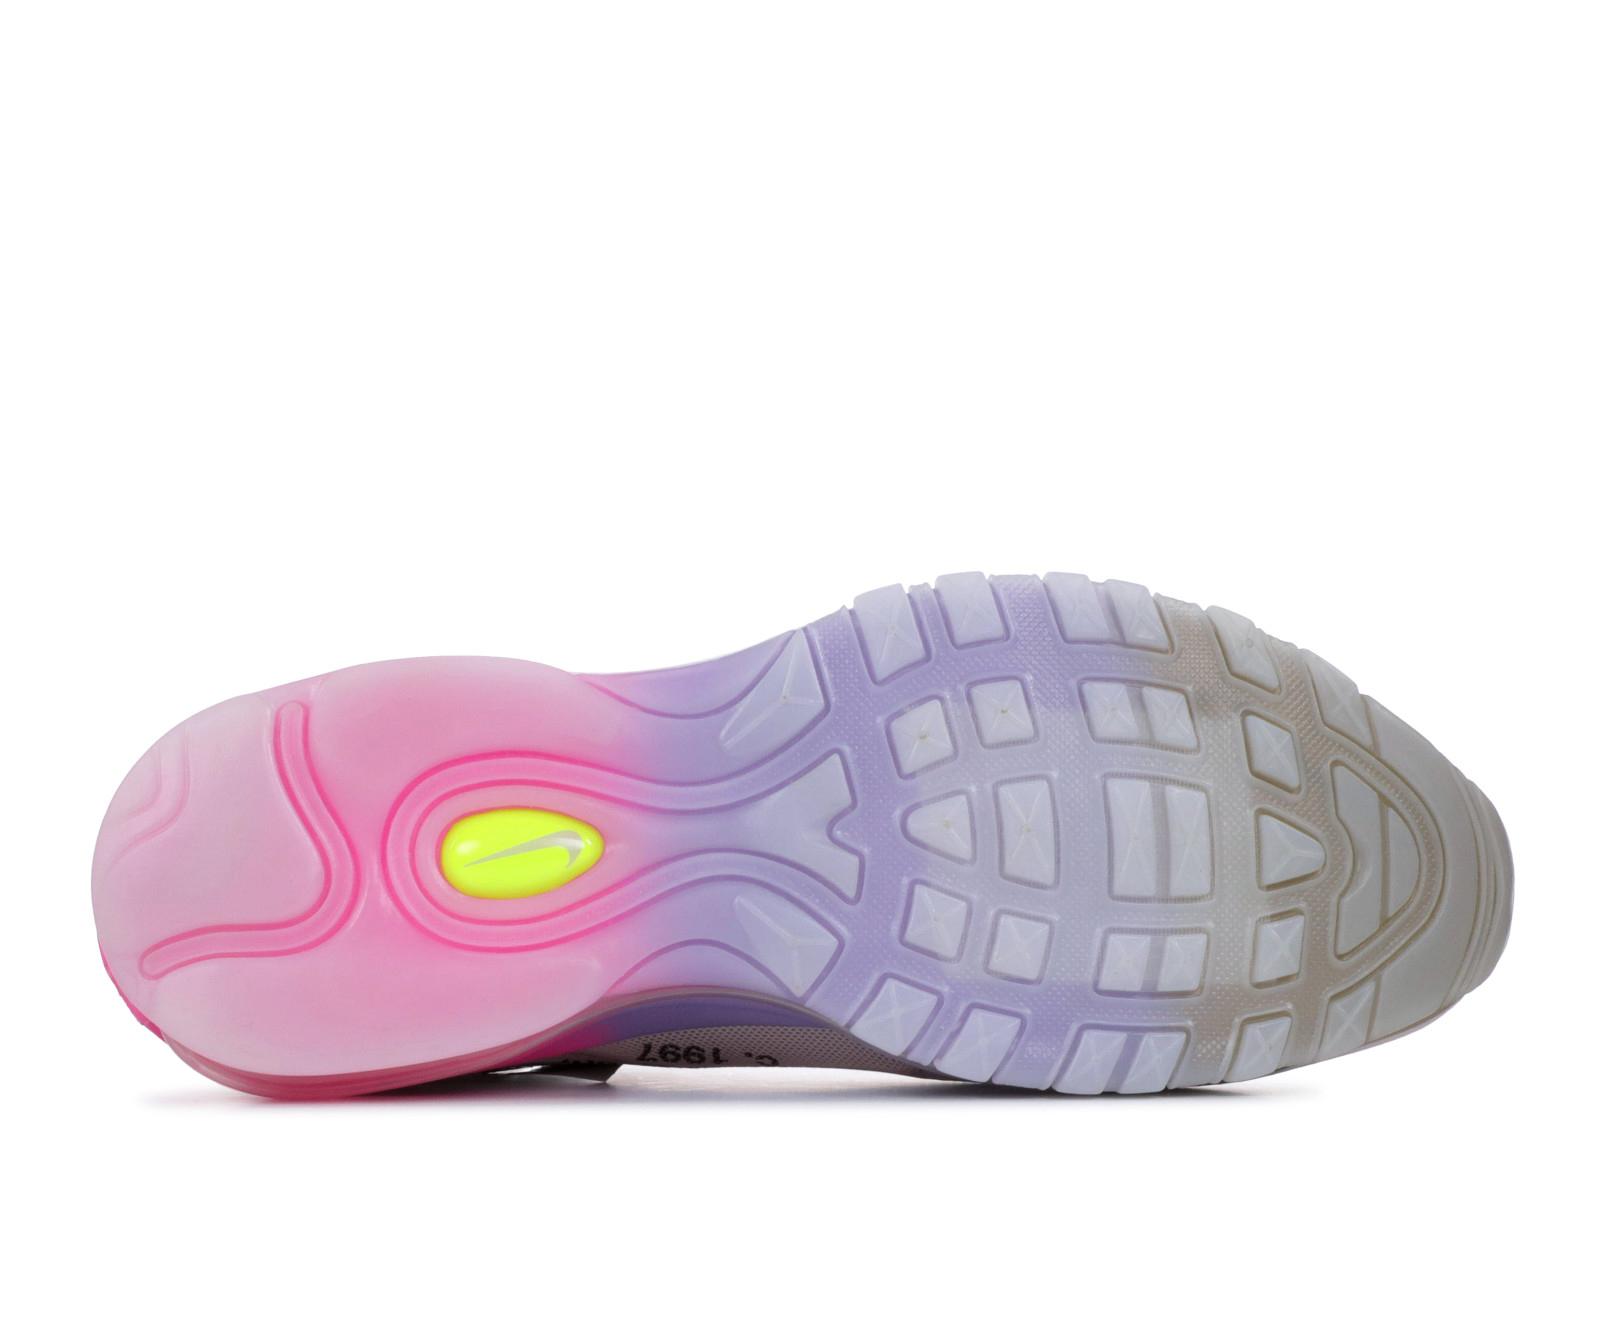 half off 153c6 e89ff Off-White Nike Air Max 97 - Elemental Rose / Serena Williams